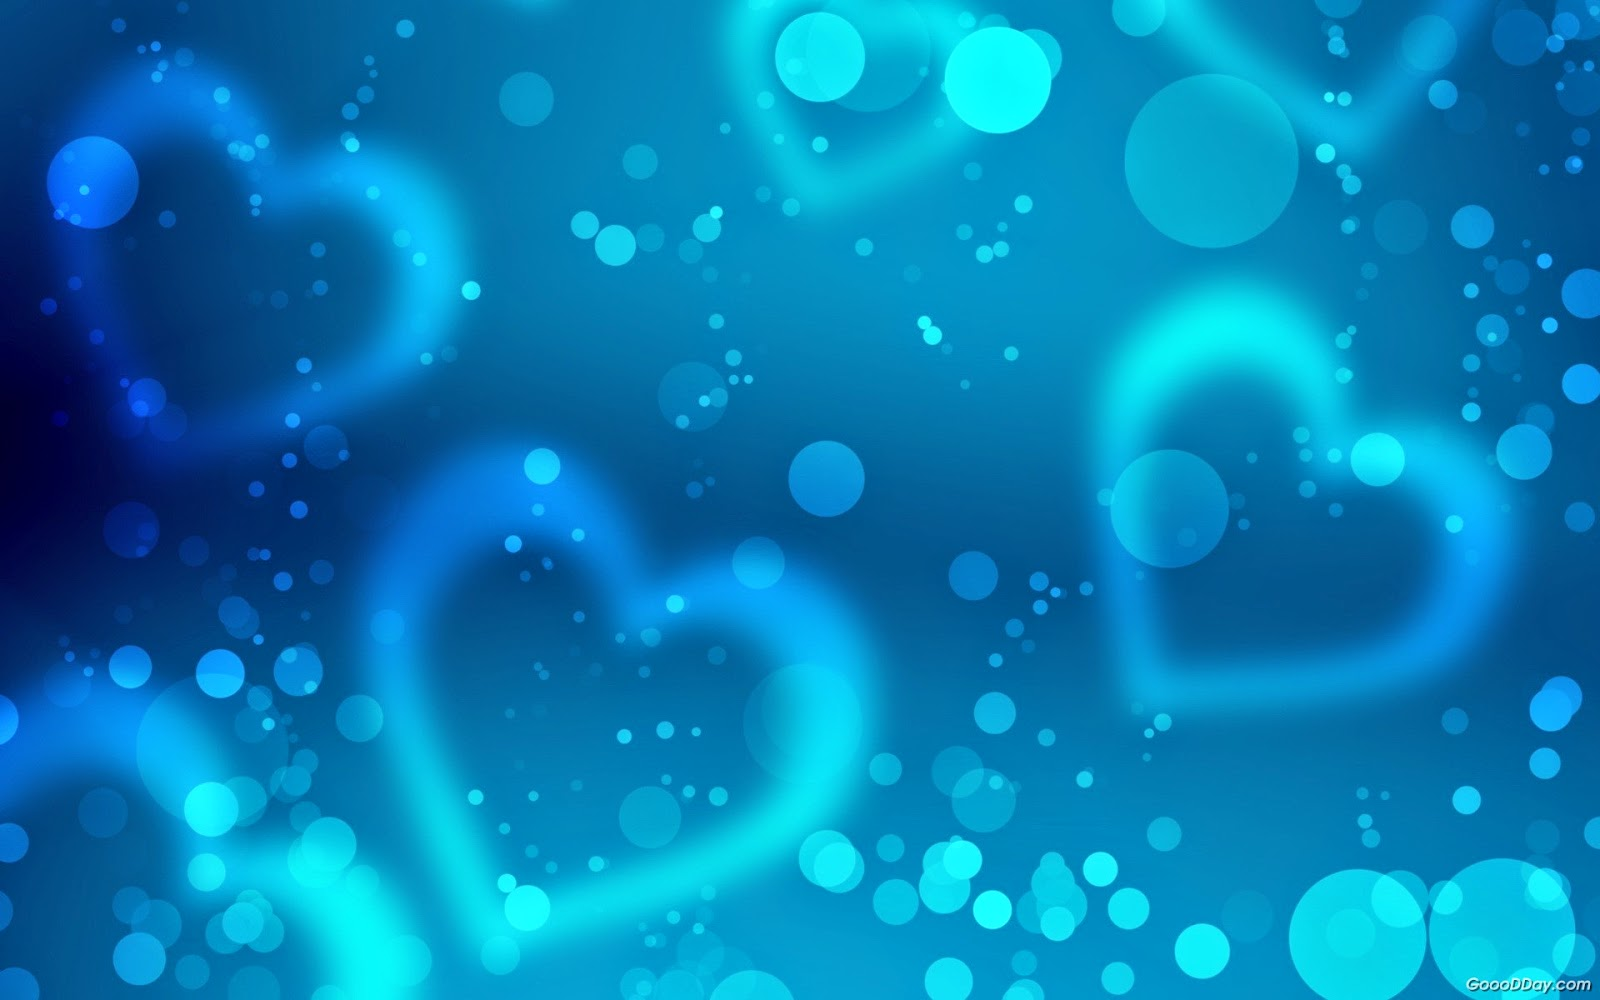 girls wallpaper 2015: love heart hd wallpapers 2015 lovely hearts